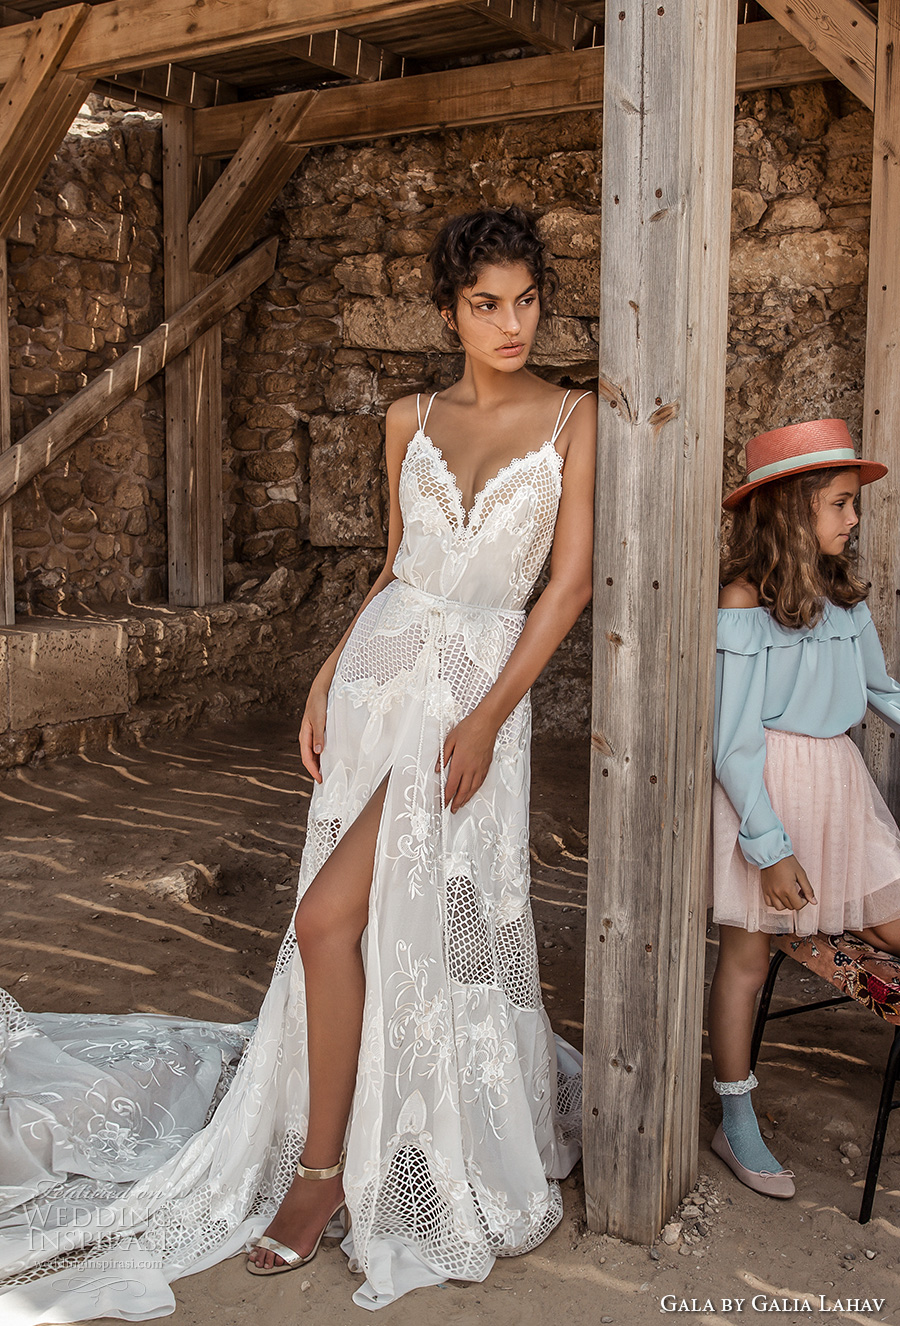 Gala by Galia Lahav 2017 Wedding Dresses  Bridal Collection no III  Wedding Inspirasi